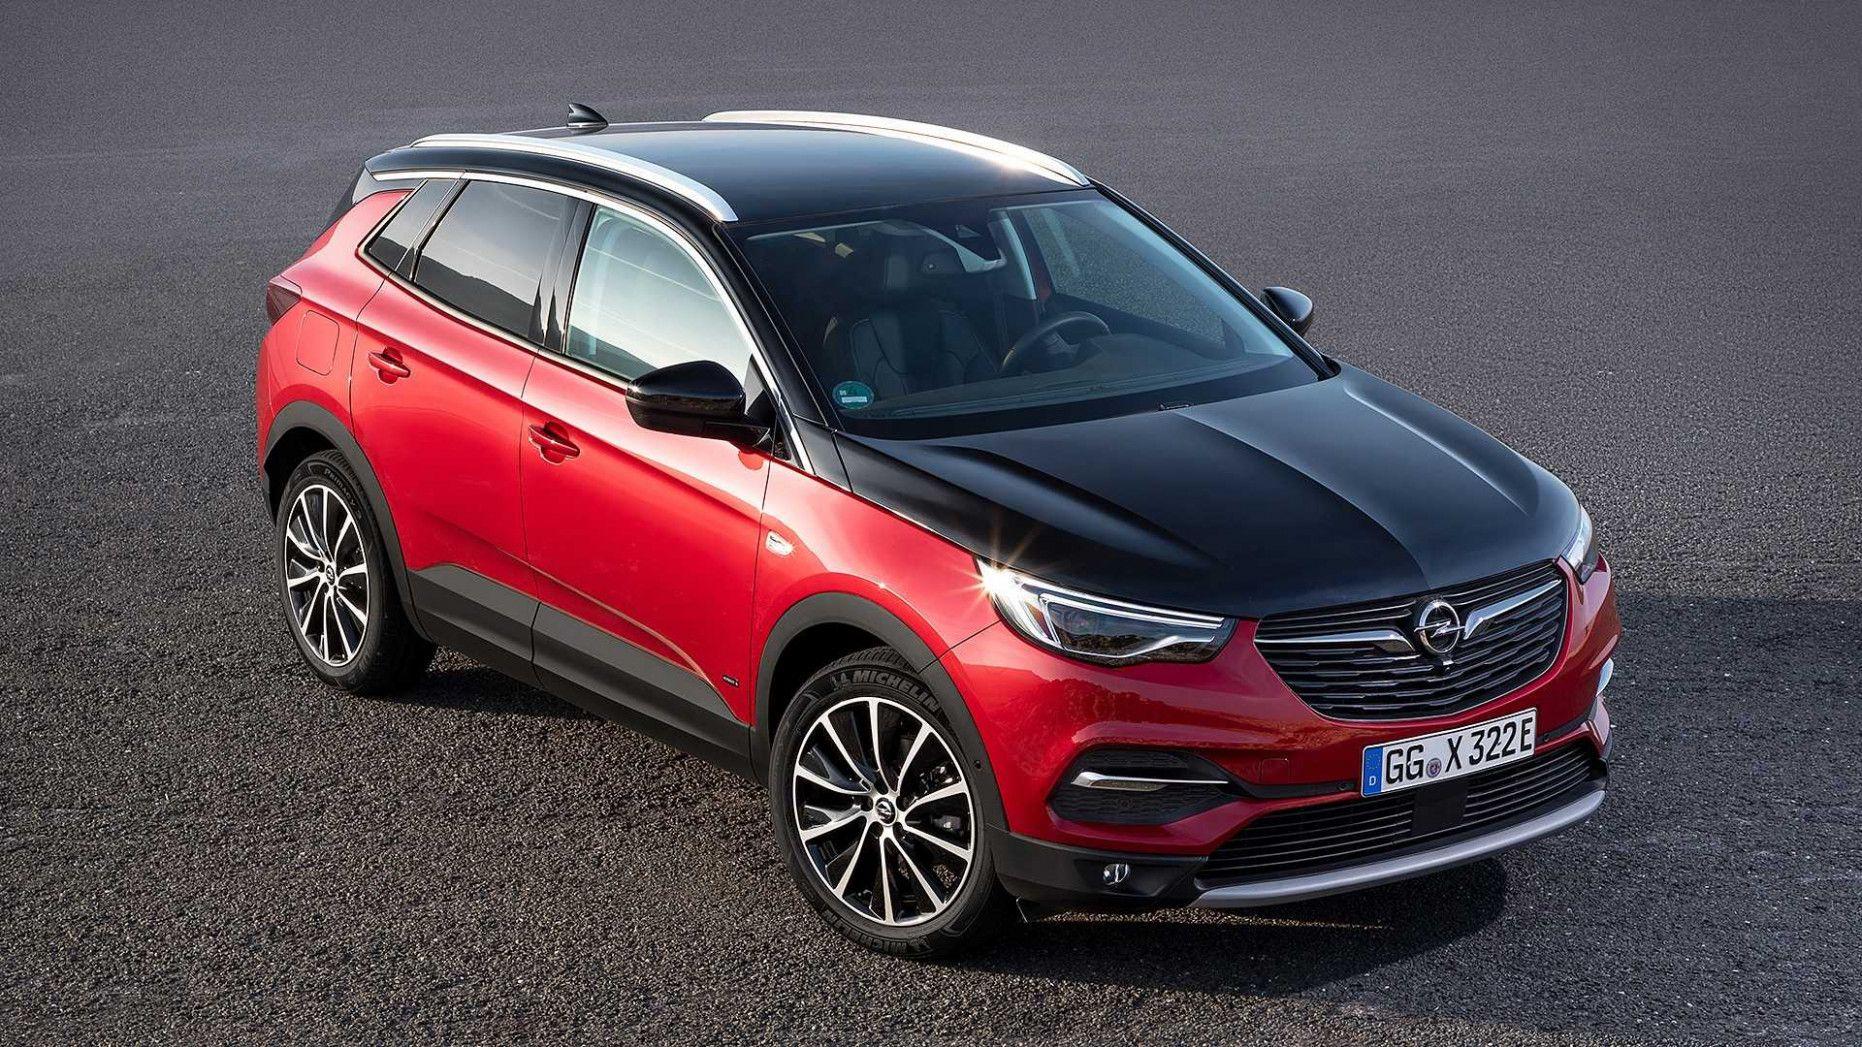 Opel Grandland X In Hibrit Versiyonu Tanitildi Opel Hybrid 2020